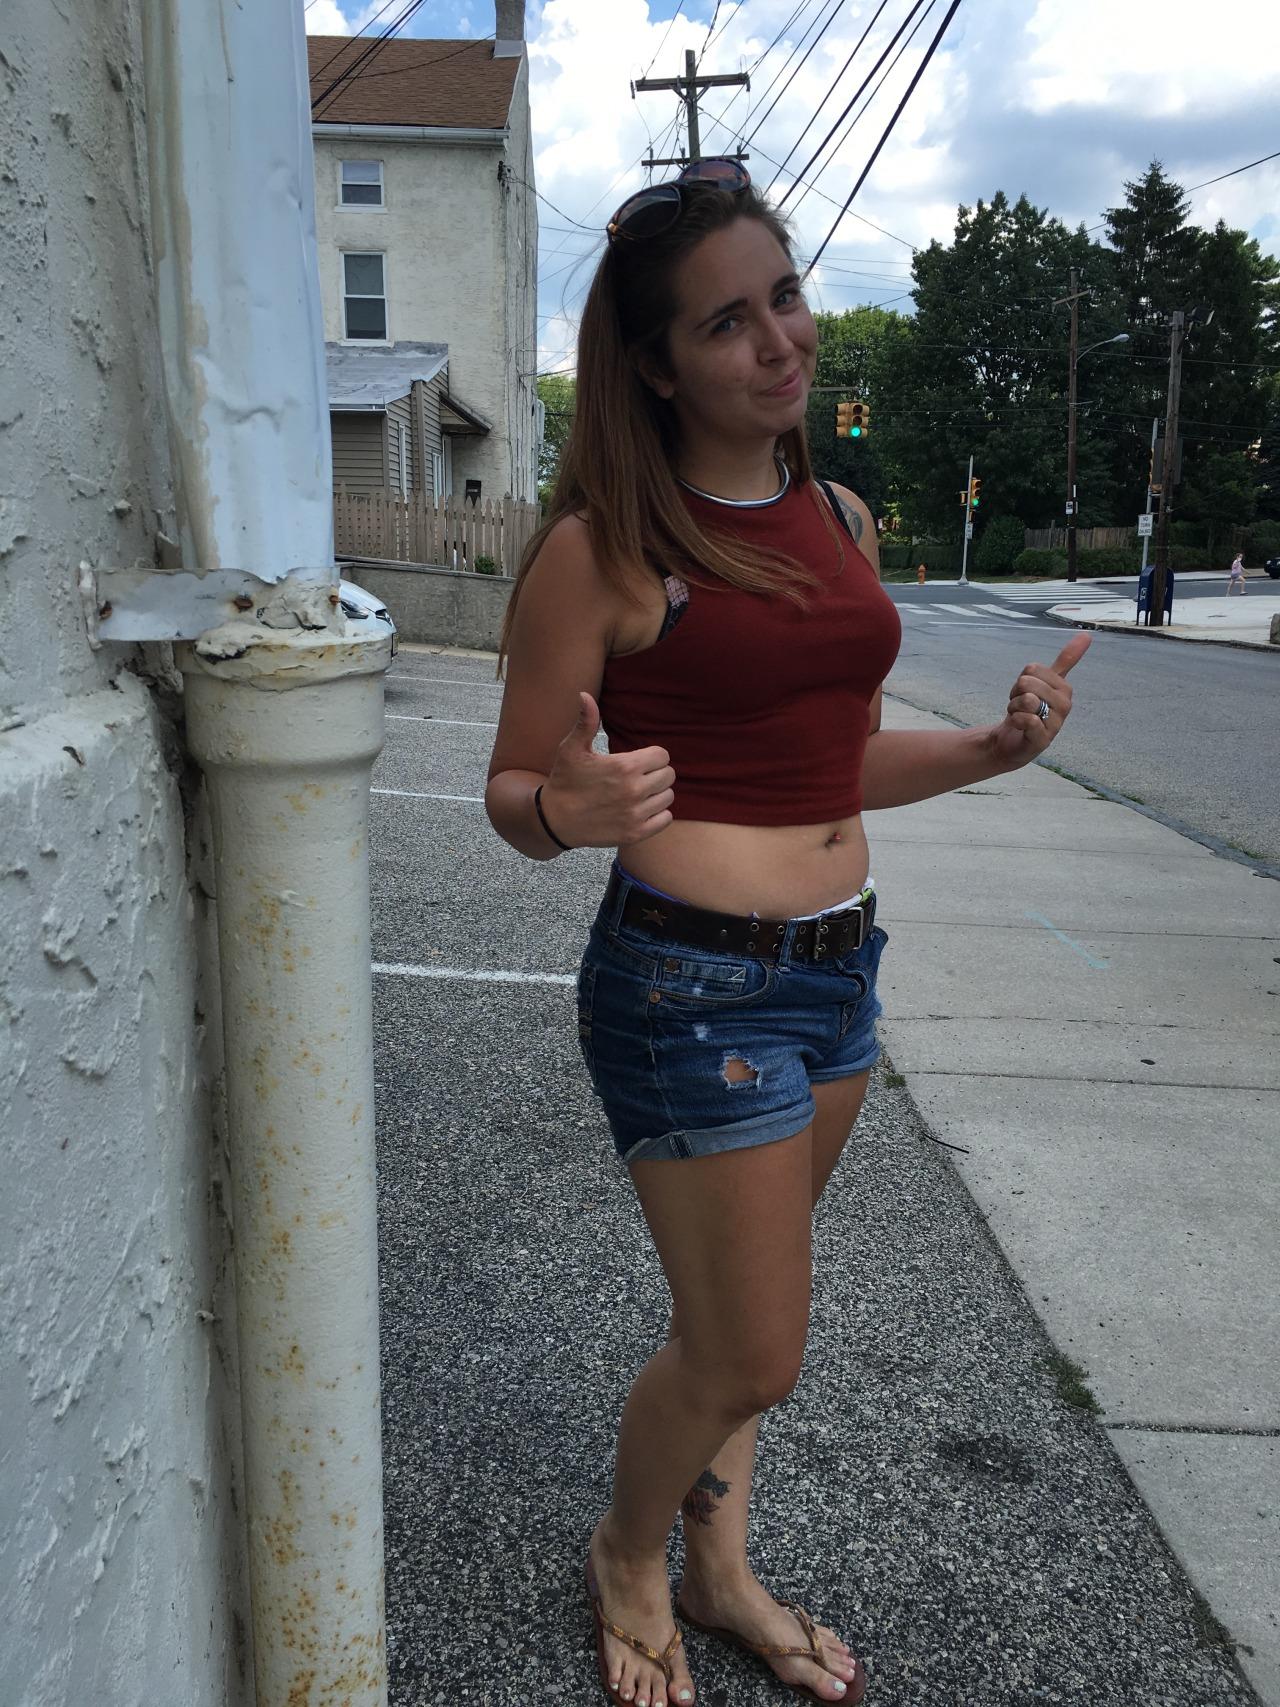 In public diapergirl Free diaper